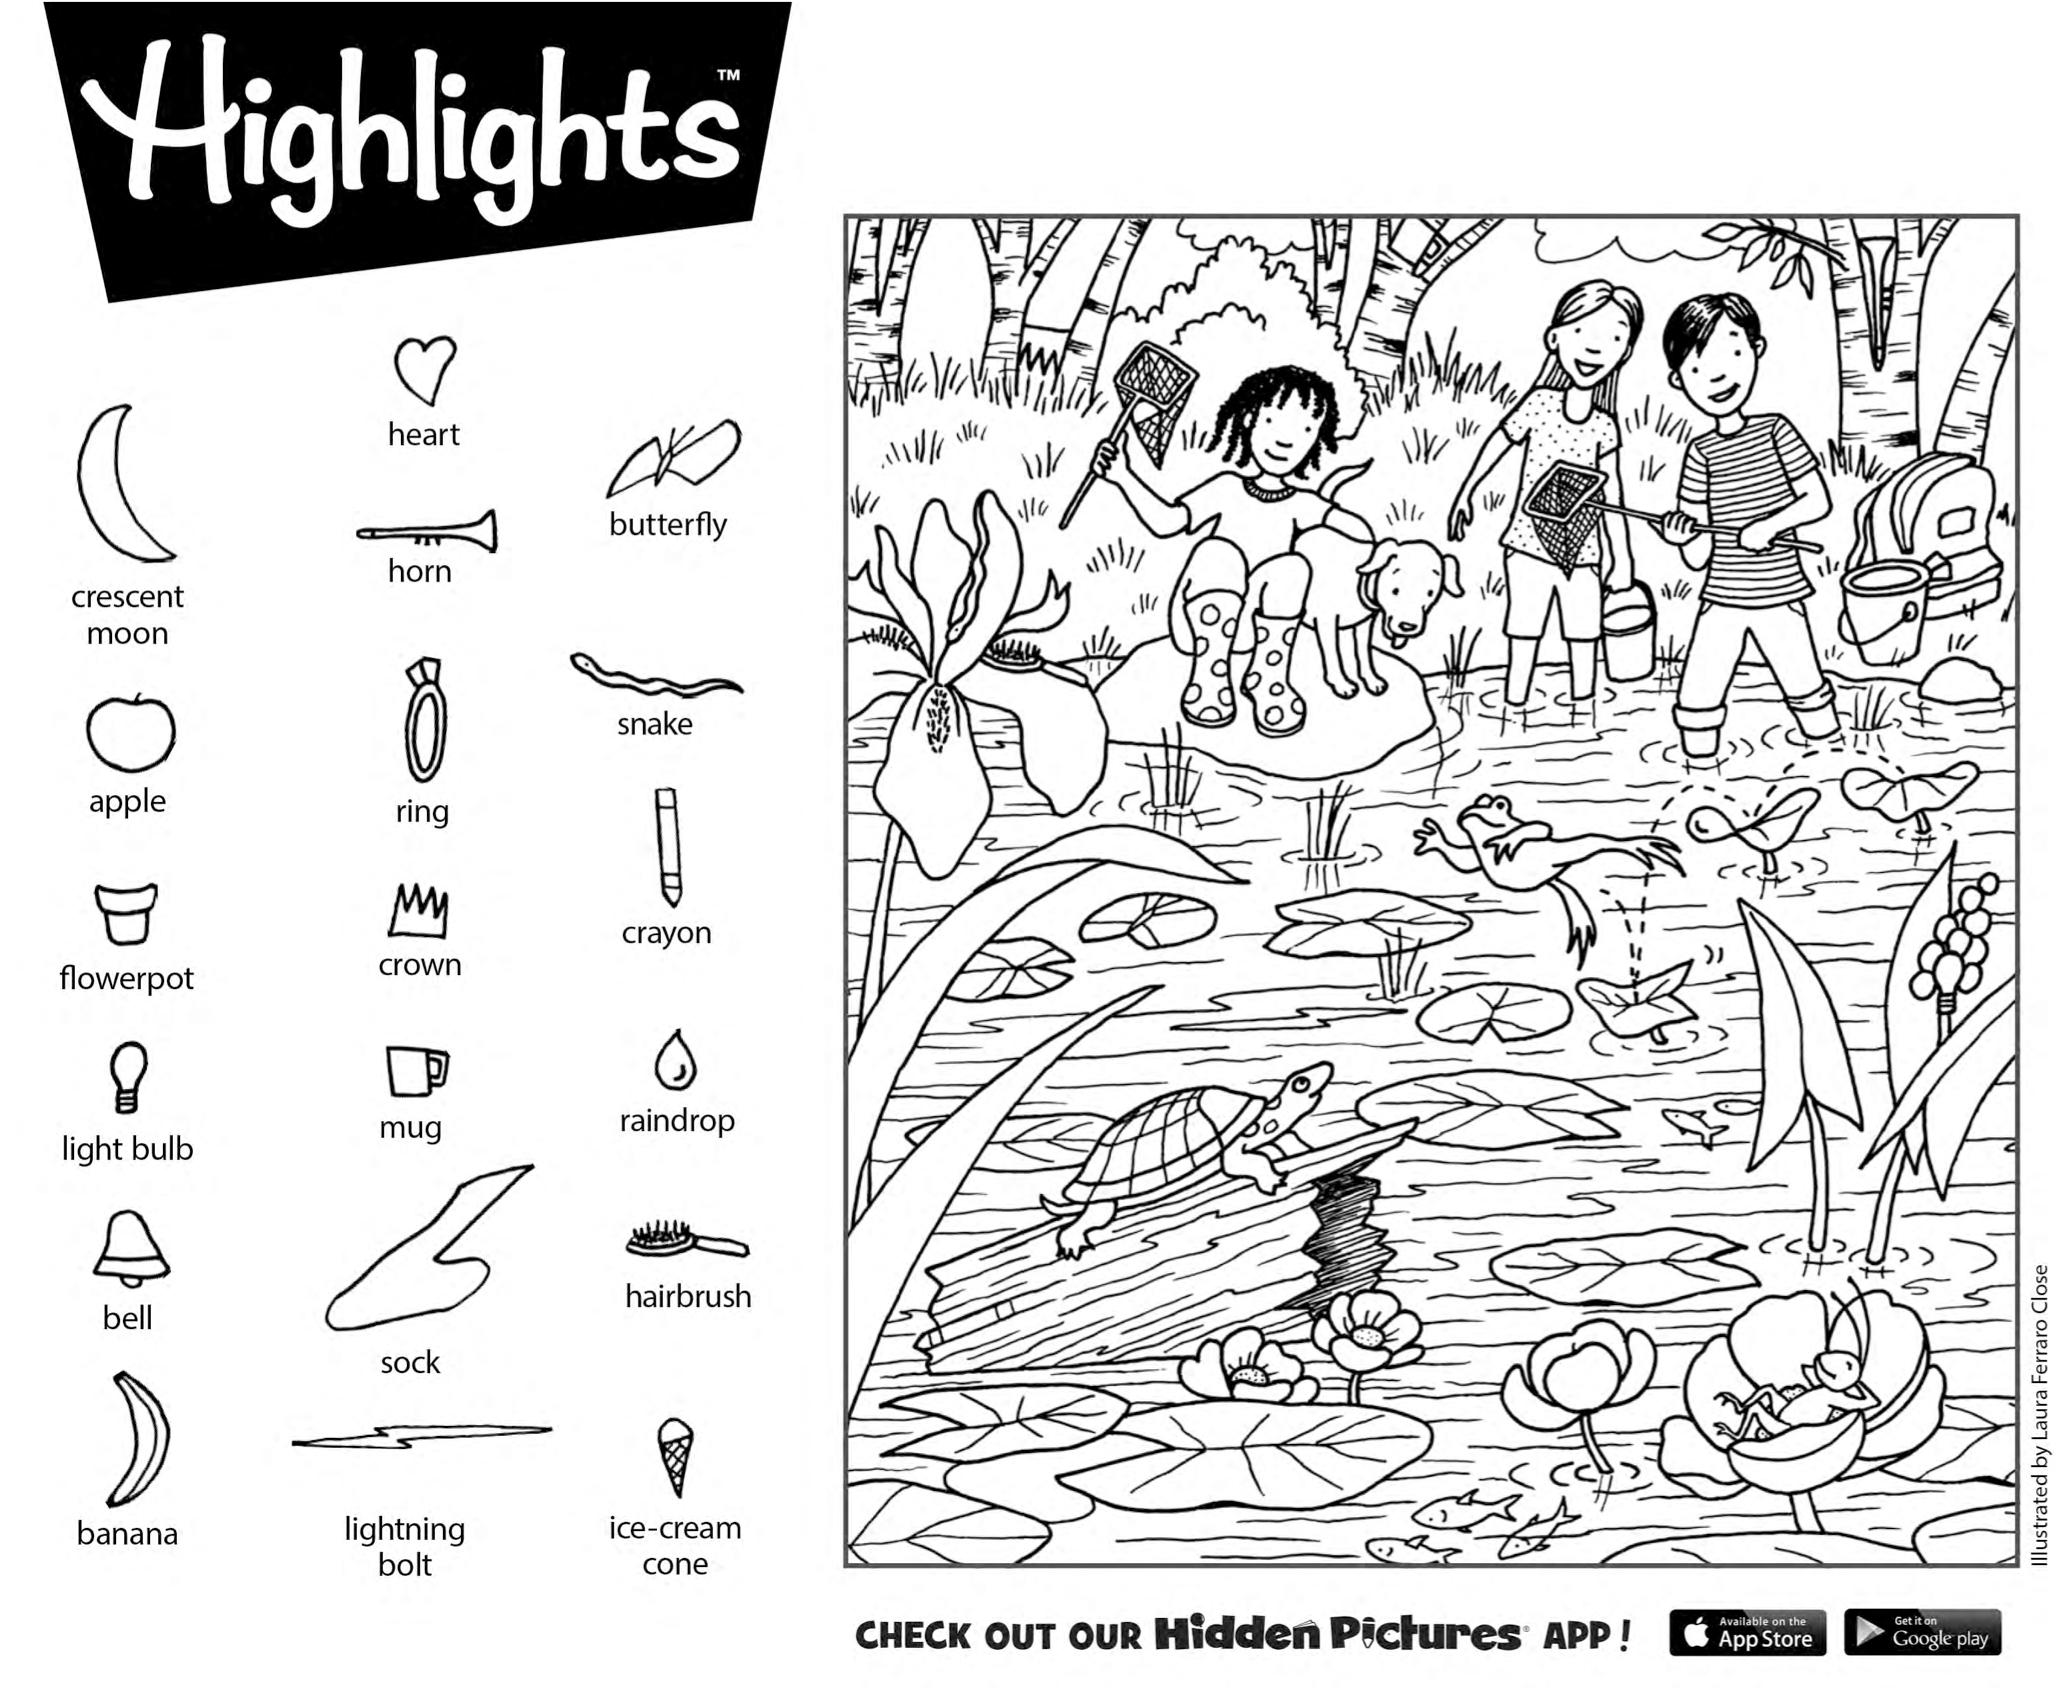 Highlights Hidden Pictures Printable Worksheets